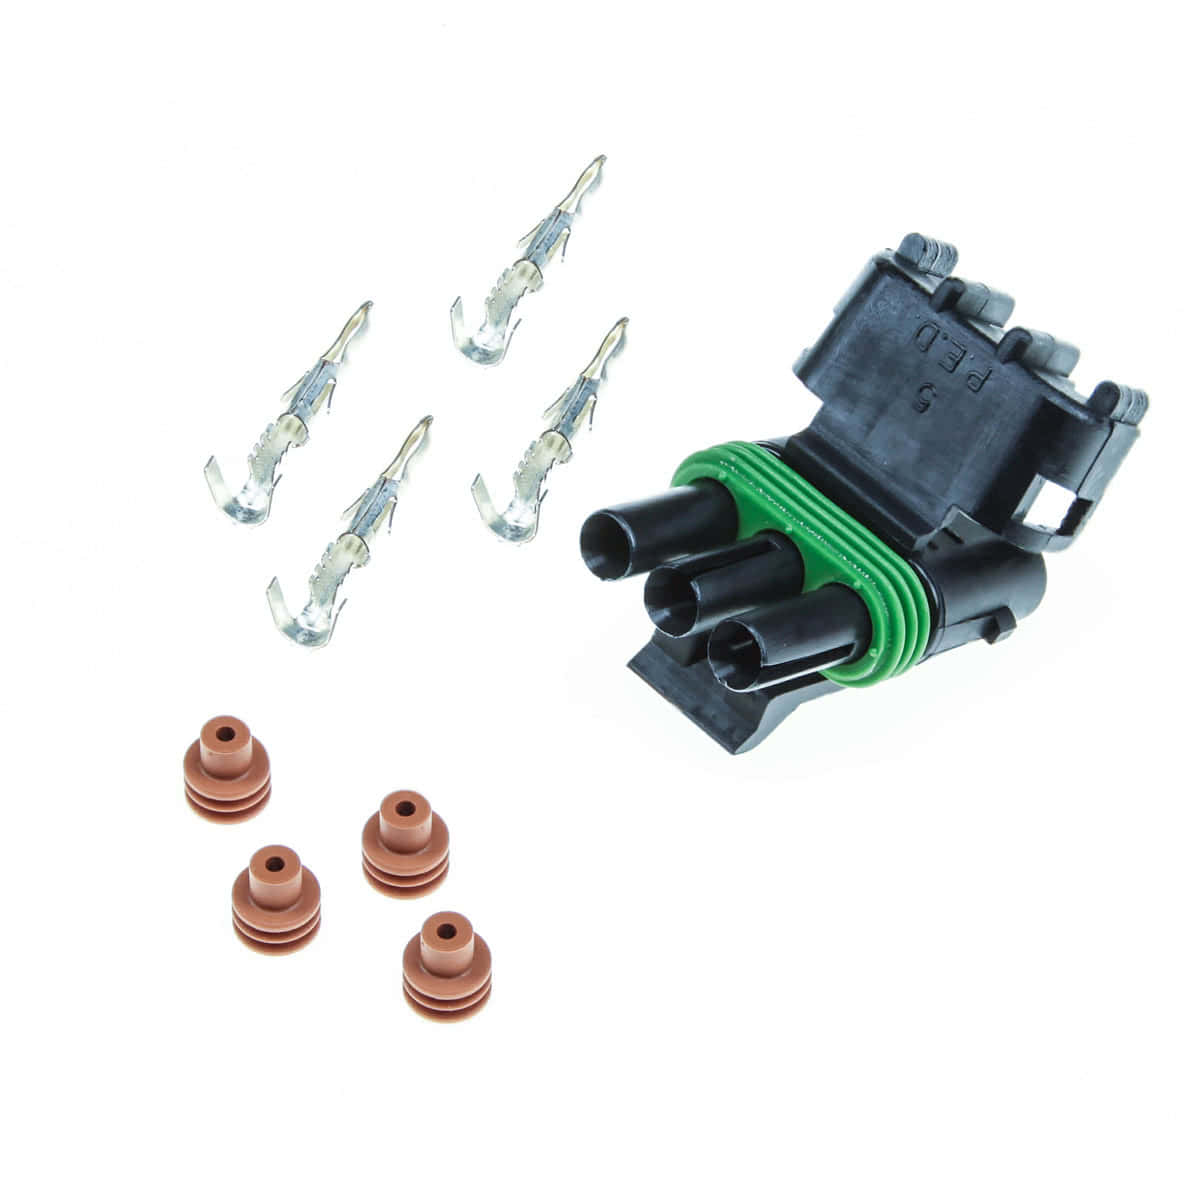 3 pin plug wiring diagram usa 7 n type trailer uk map gm bar sensor uncrimped connector